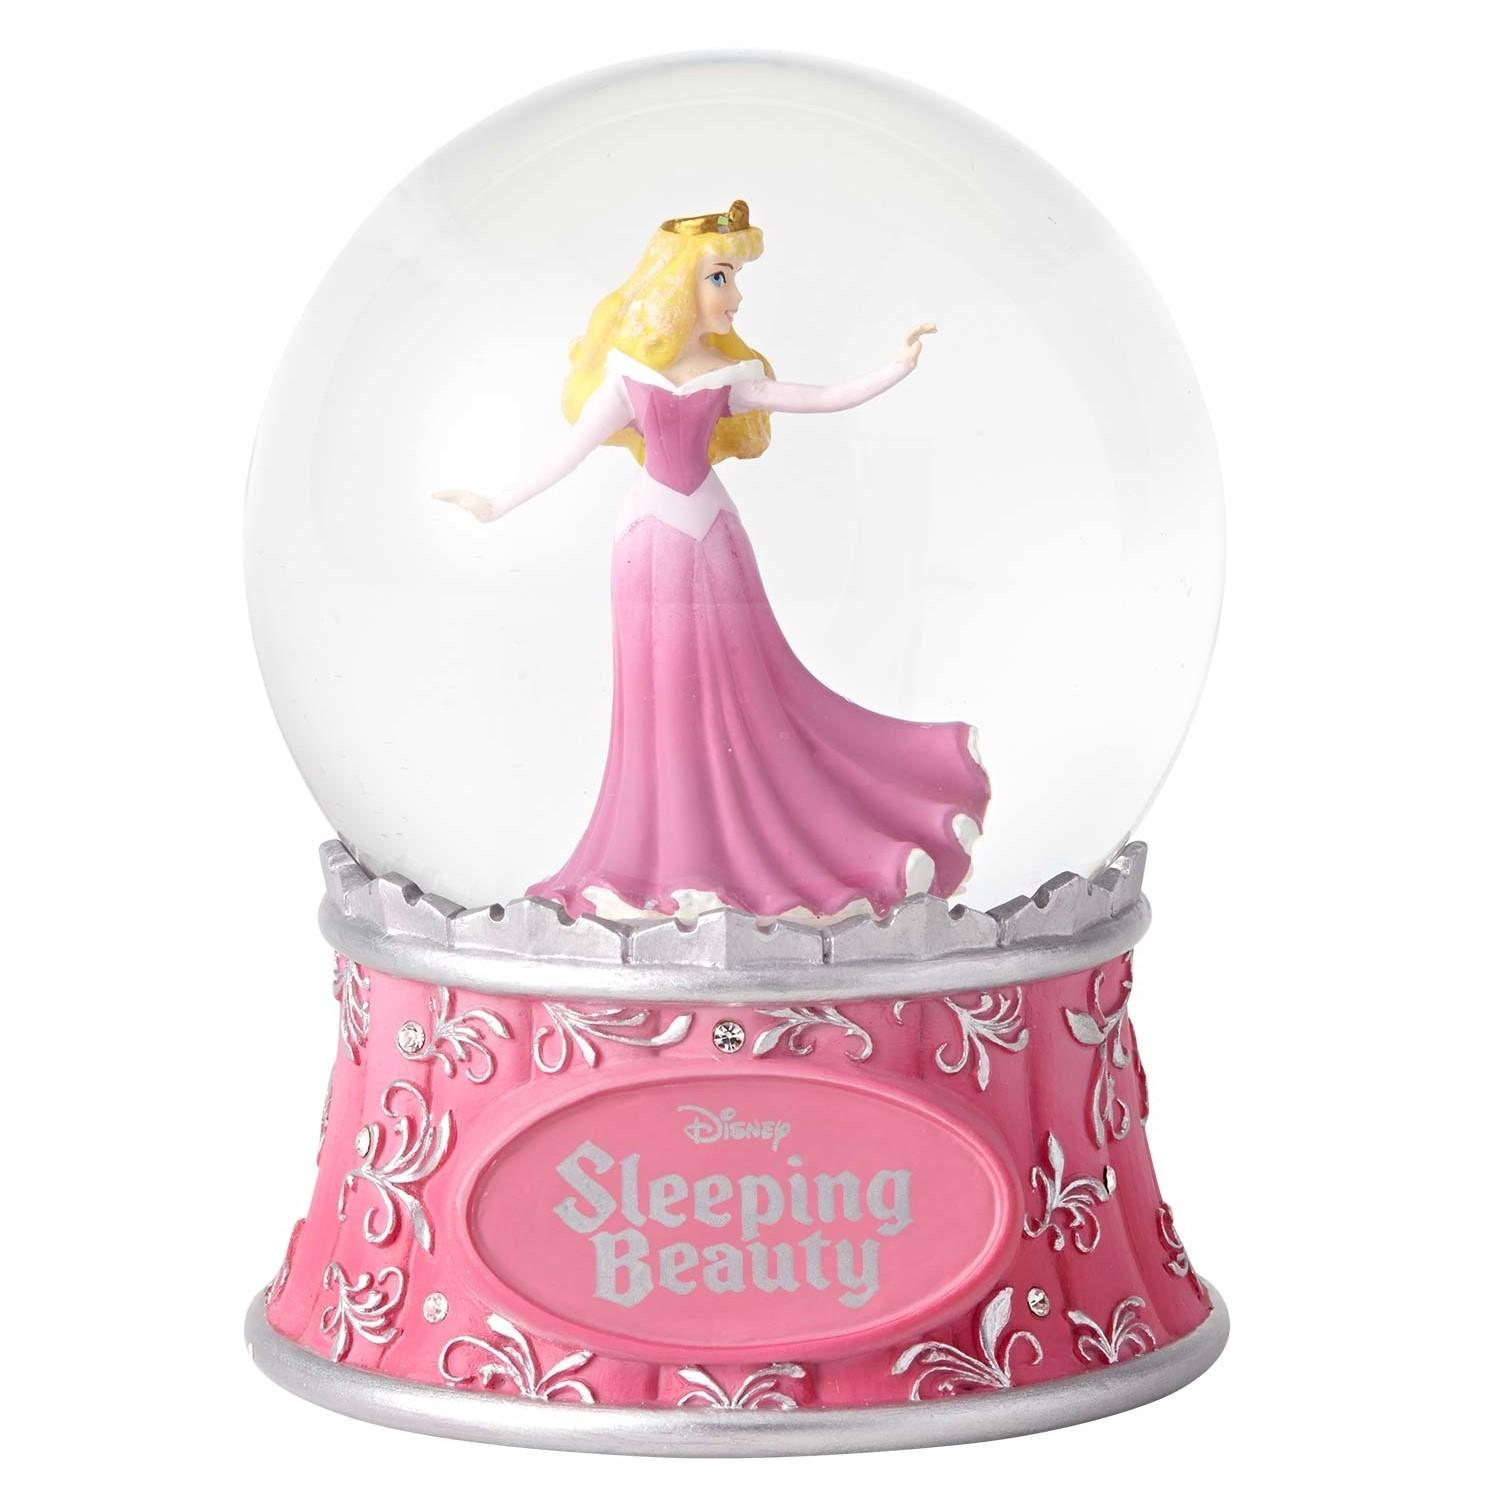 Disney Showcase Sleeping Beauty Aurora Water Globe Disney Collectibles